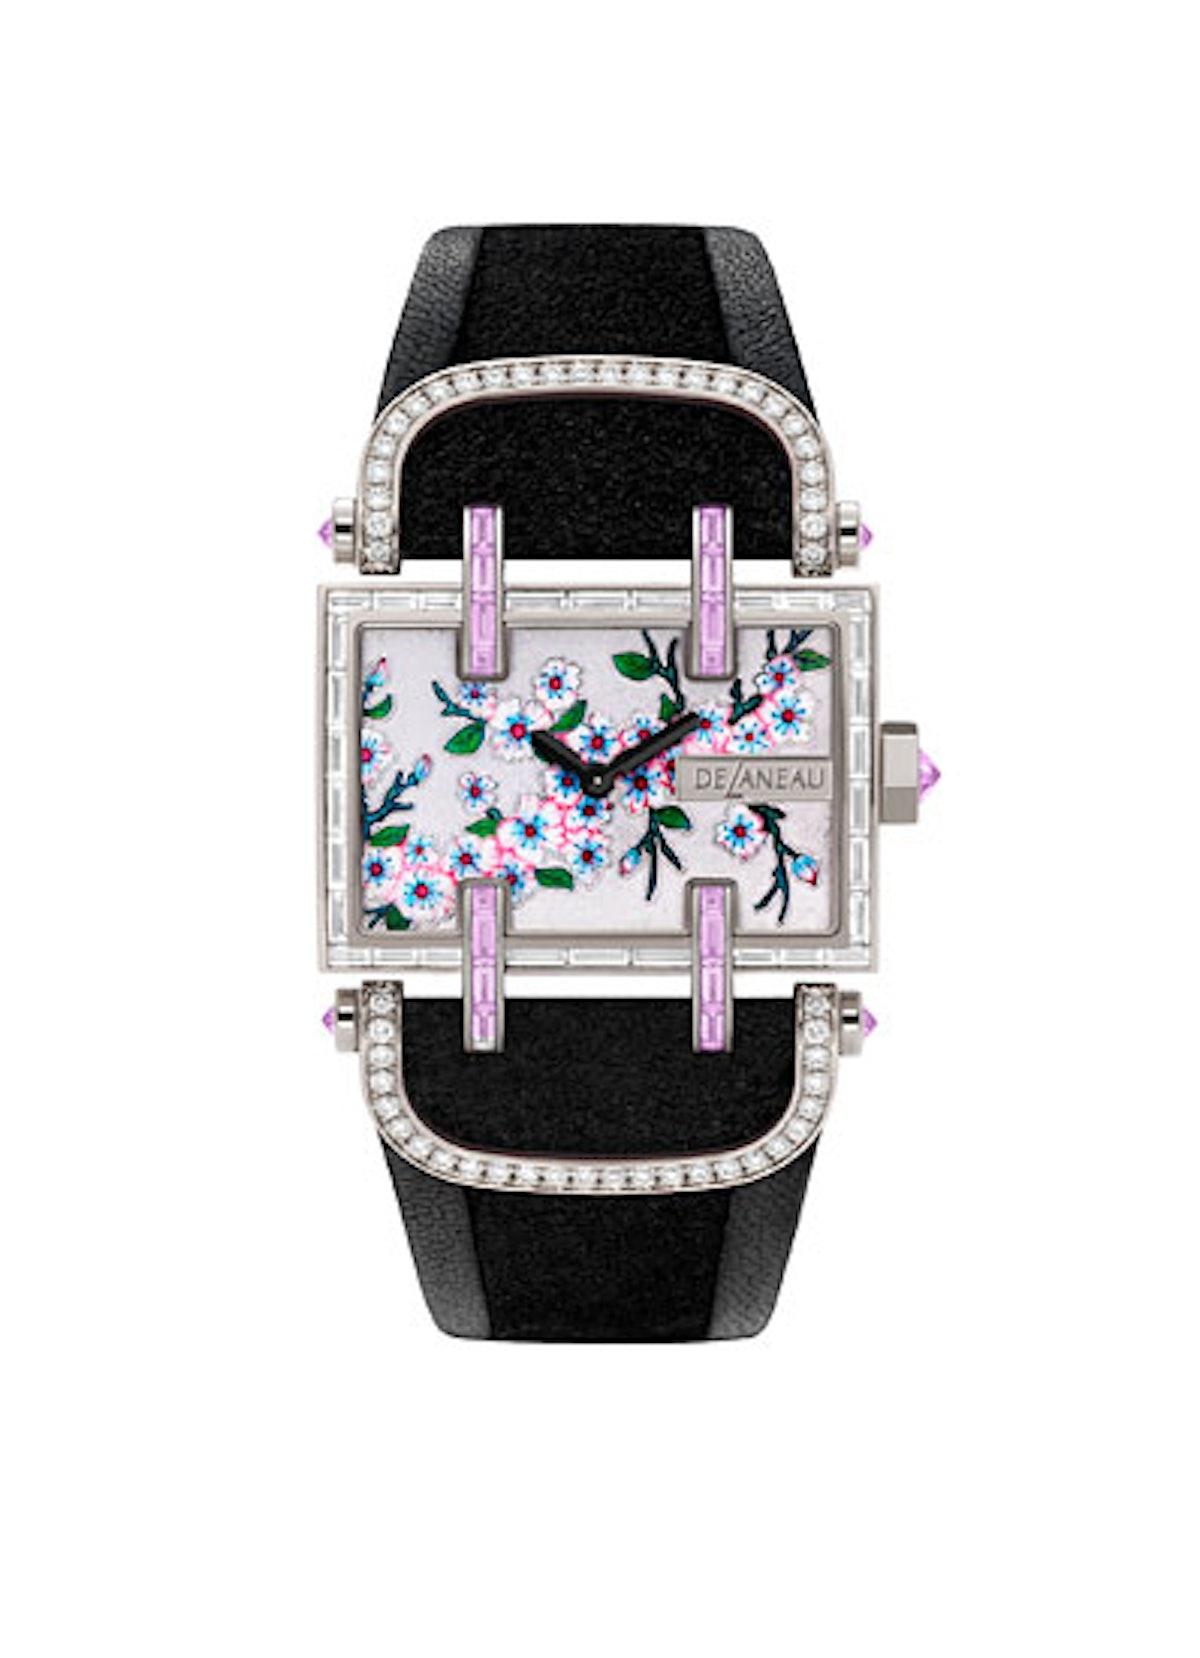 acss-basel-watches-roundup-02-v.jpg